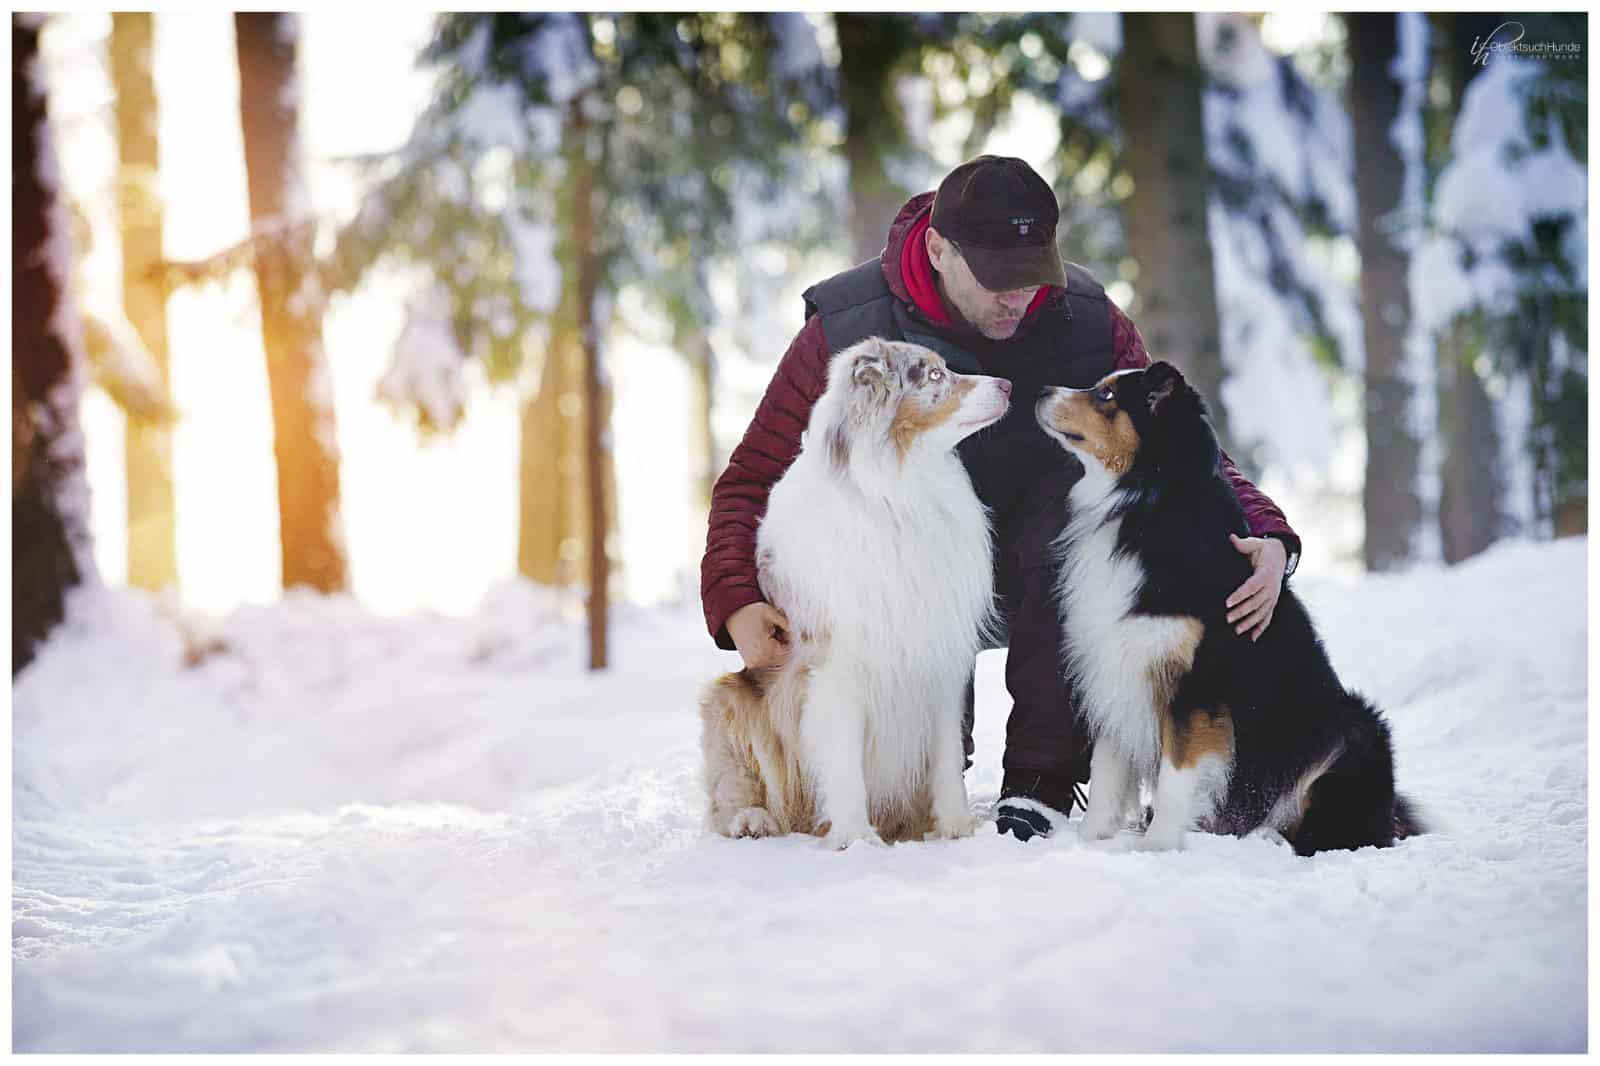 Das Jahr des Hundes 2018 - Kai Hartmann - Hundeschule Dresden - Hundetrainer